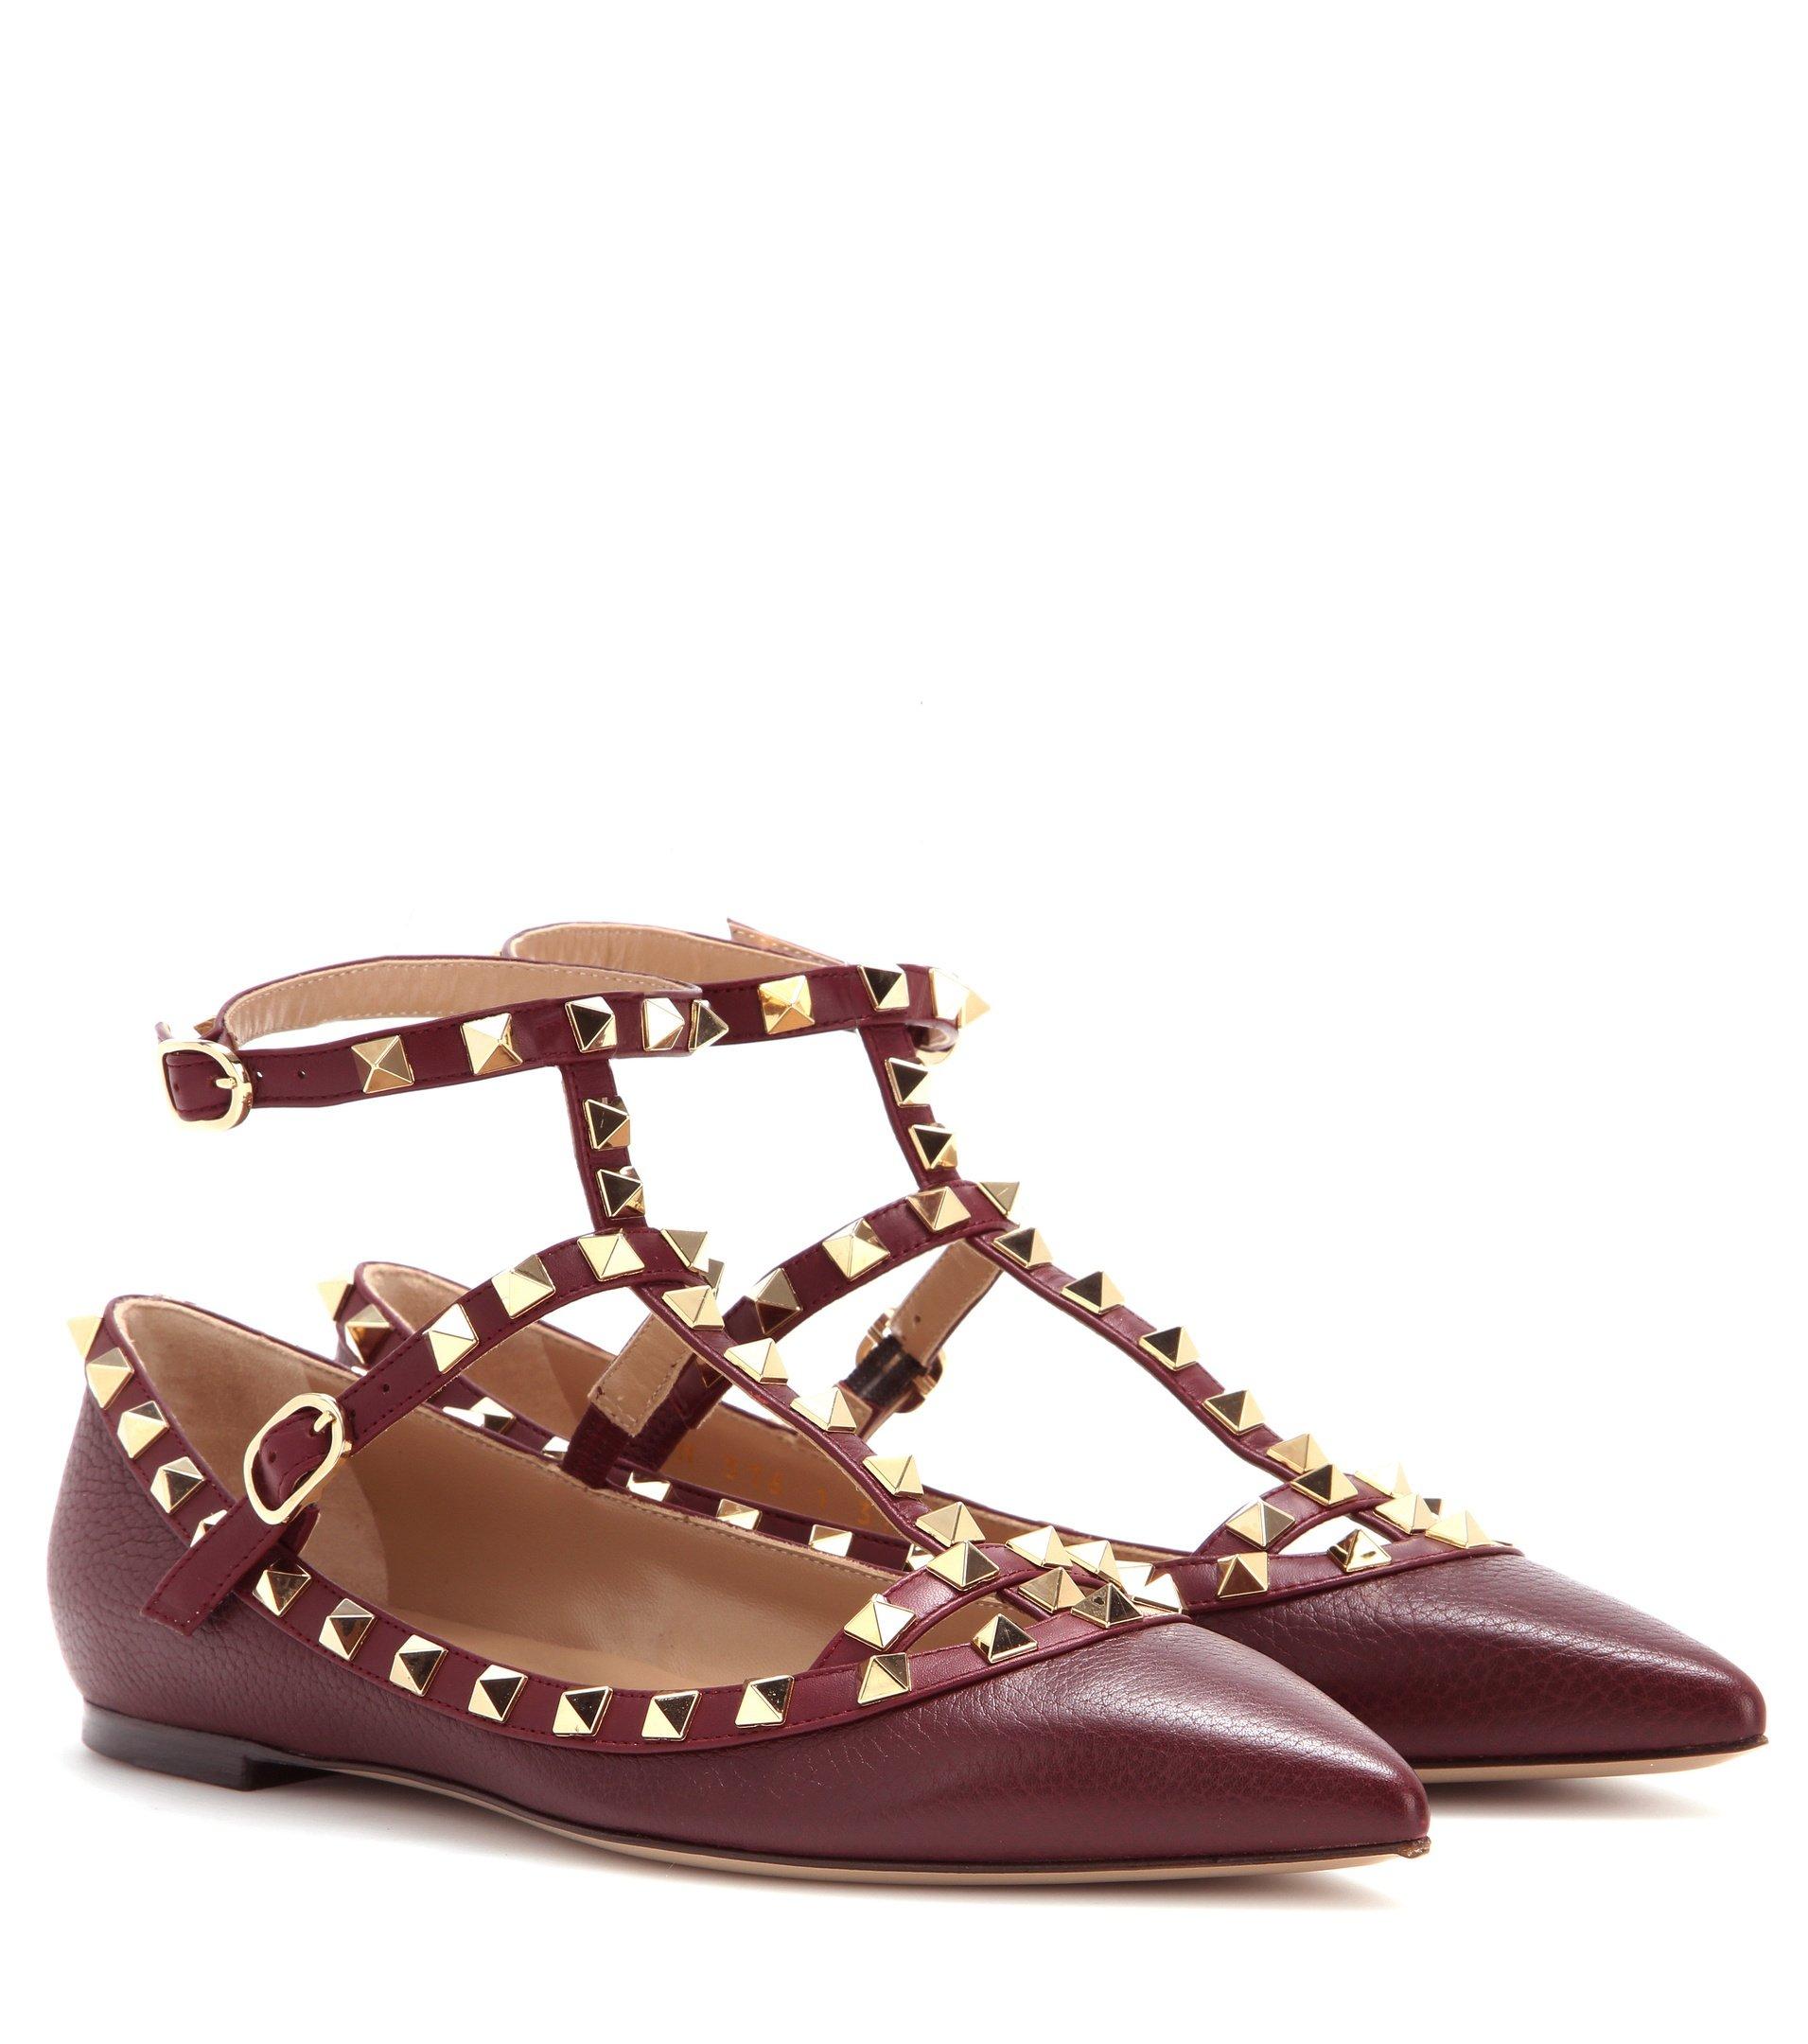 valentino garavani rockstud leather ballerinas in brown lyst. Black Bedroom Furniture Sets. Home Design Ideas